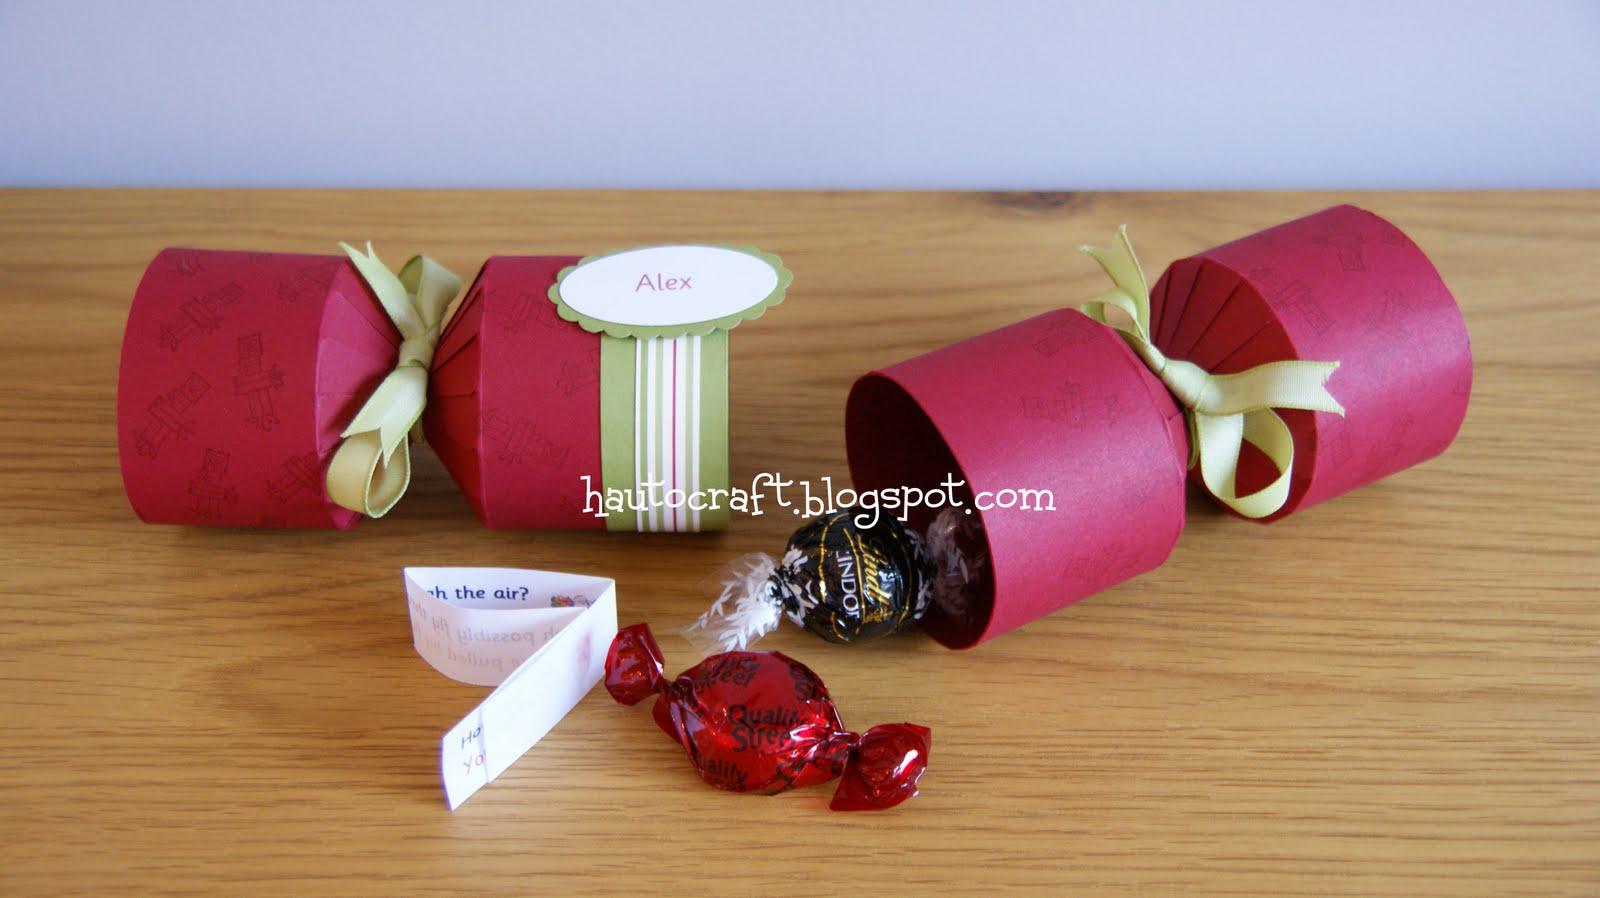 Hau To Craft Christmas Crackers : Christmas2BCracker2B 2BAlex2B2 from hautocraft.blogspot.co.uk size 1600 x 898 jpeg 111kB